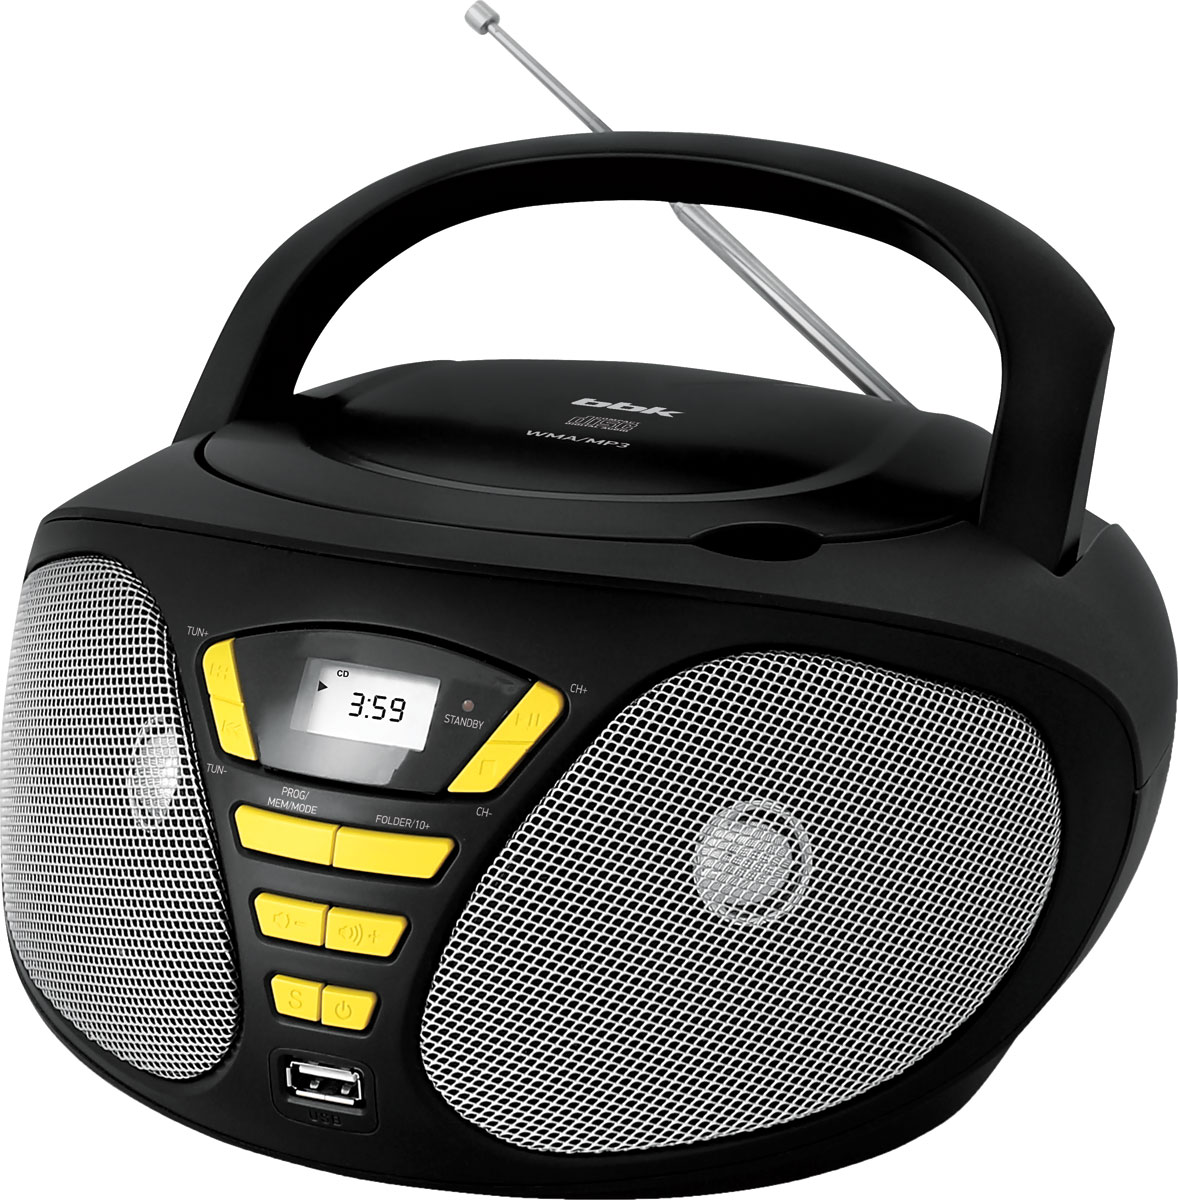 лучшая цена Магнитола BBK BX180U, Black Yellow CD/MP3